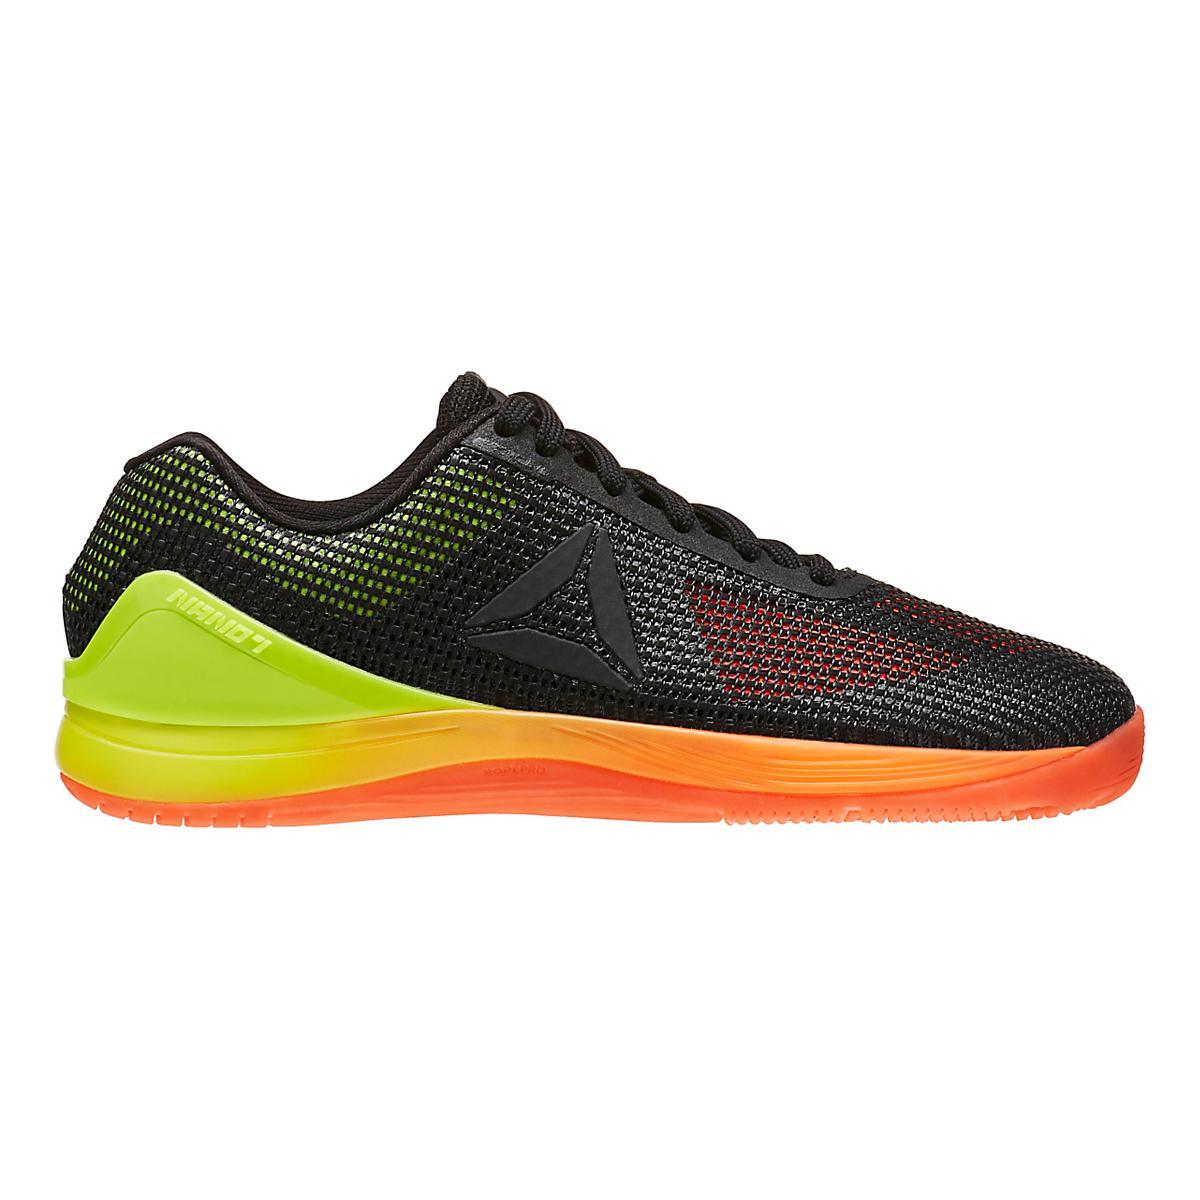 31cff26c470a Womens Reebok CrossFit Nano 7 Weave Cross Training Shoe at Road Runner  Sports